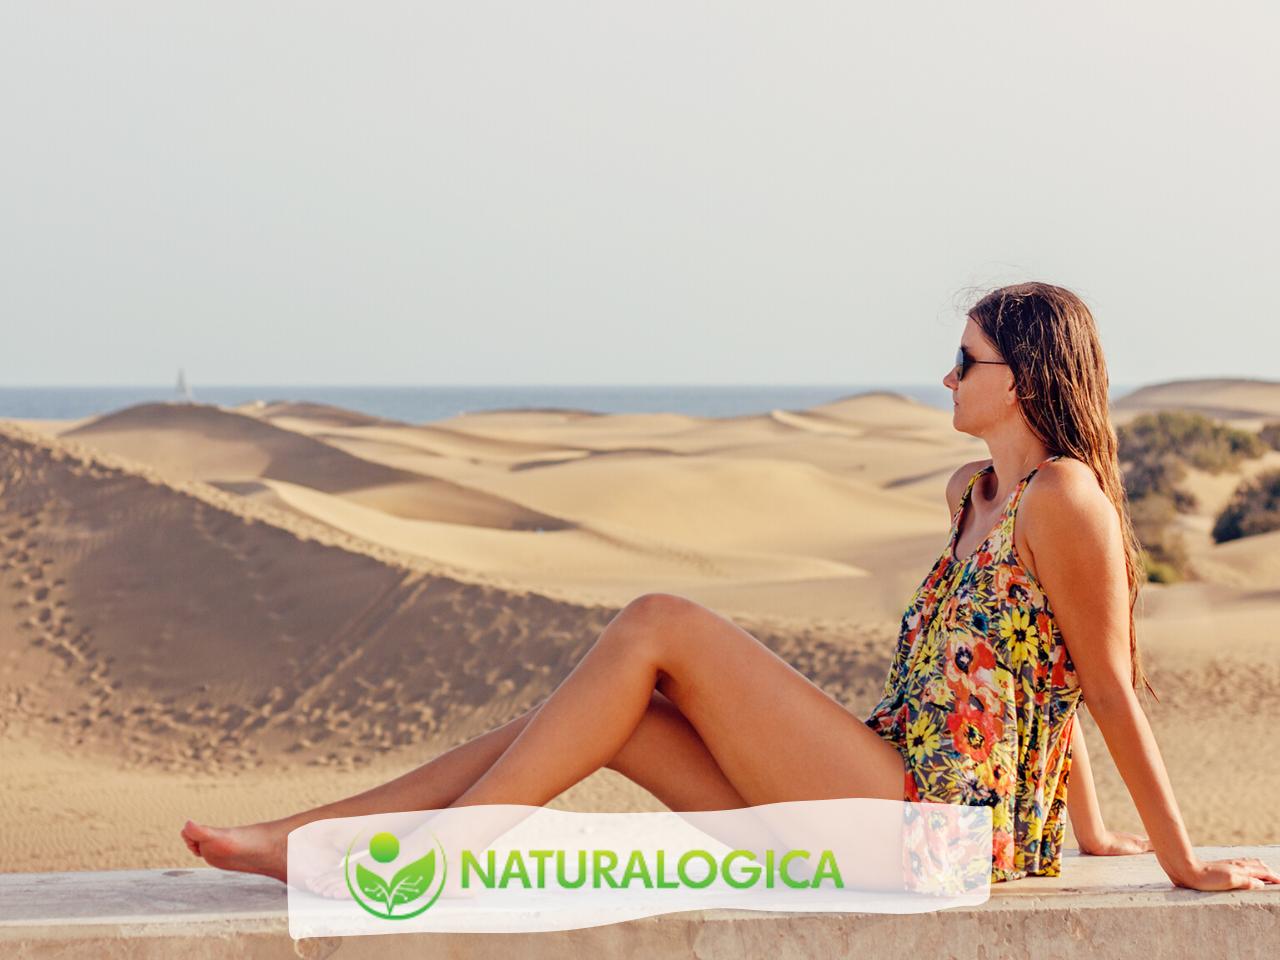 Olio doposole naturale a base di oli essenziali.